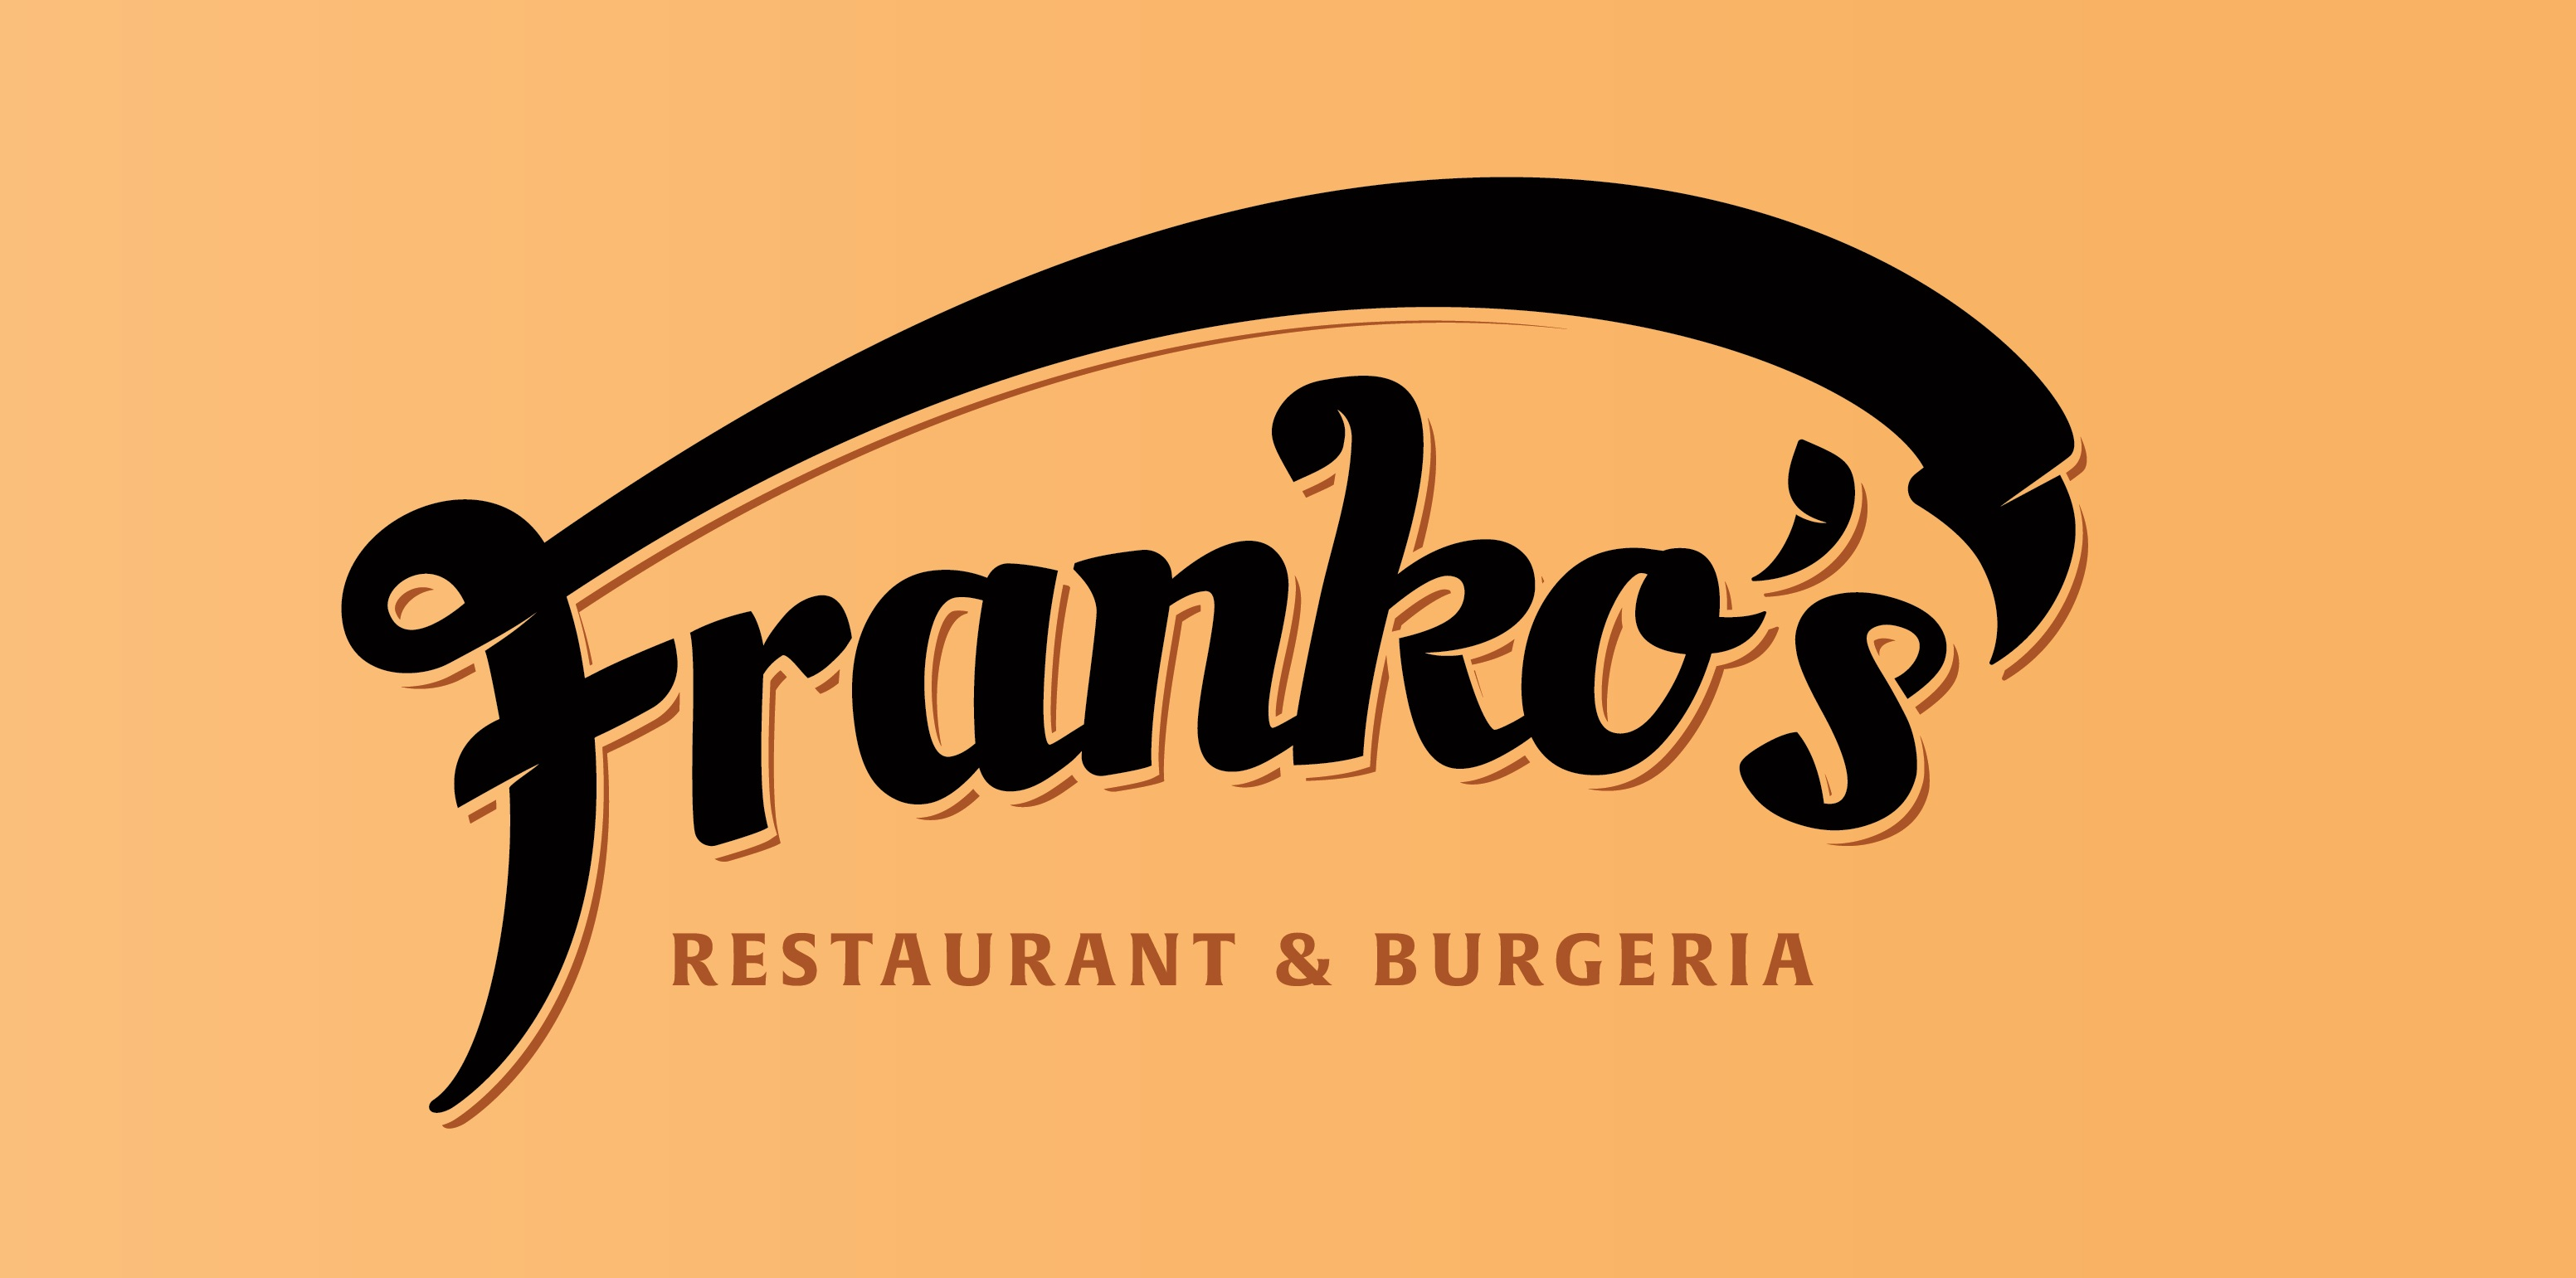 Fotka Frankos Restaurant Burgeria & Pizzeria